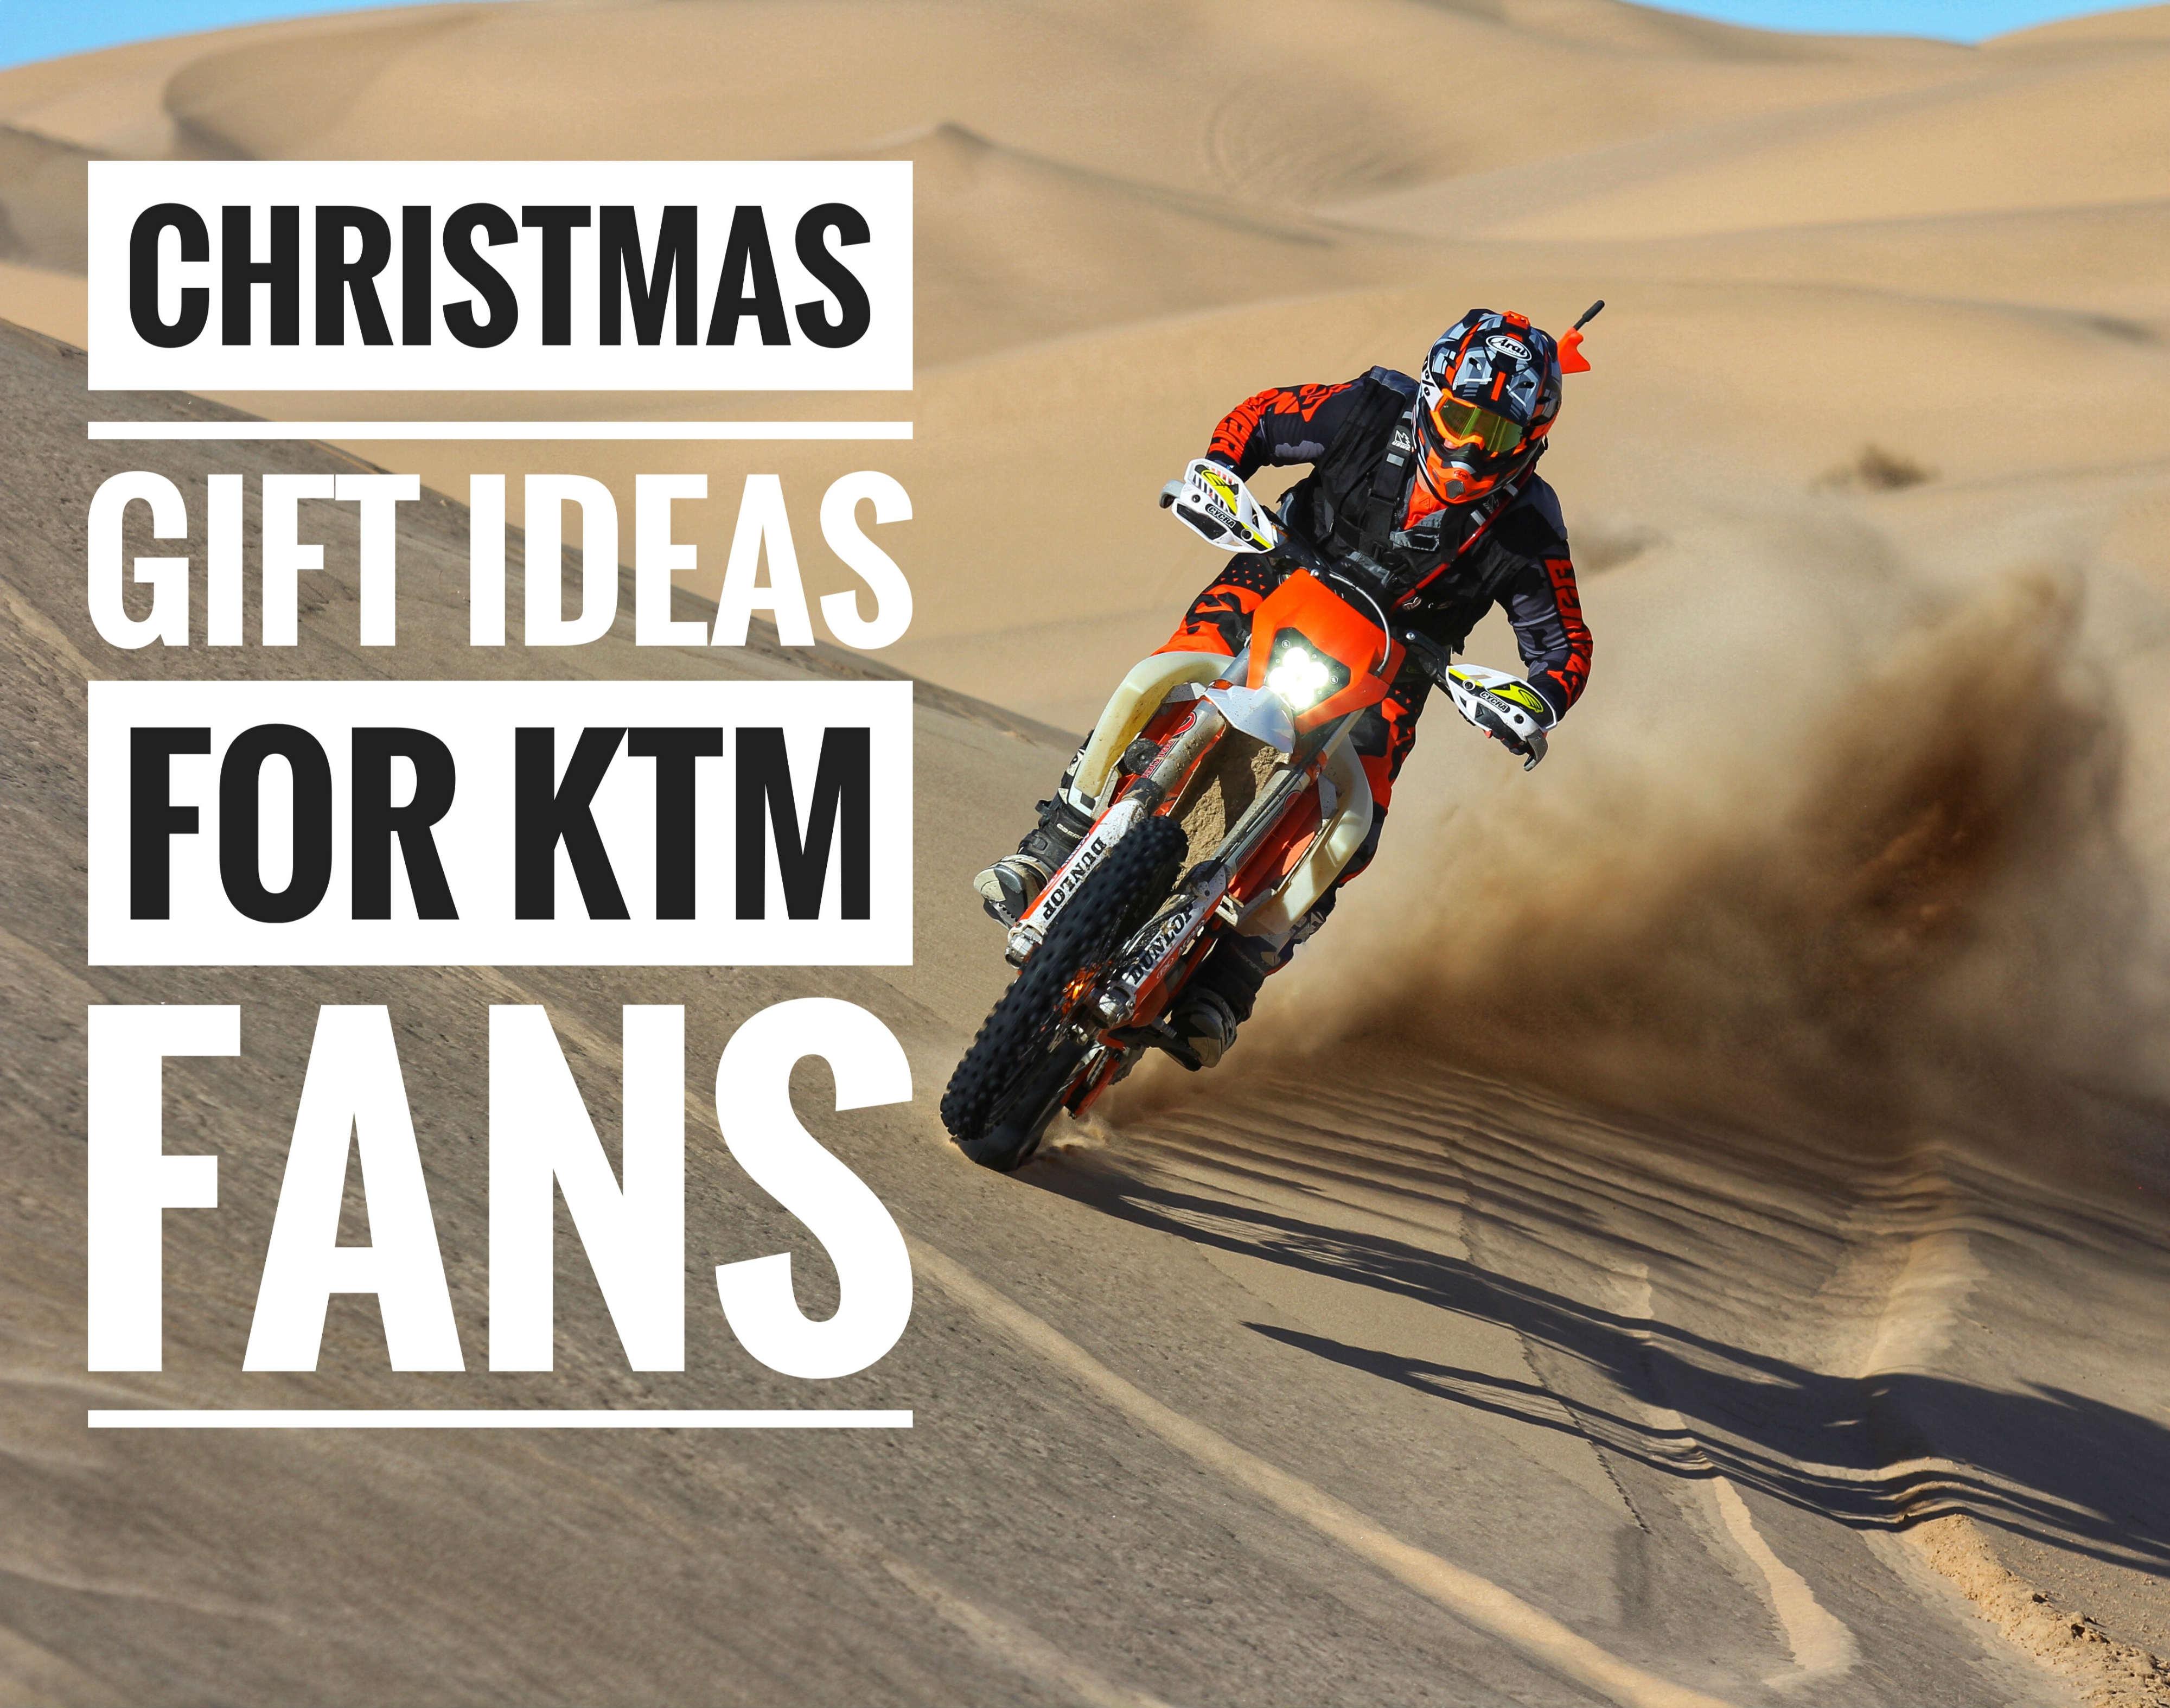 Christmas Gift Ideas For Ktm Fans Chapmoto Com